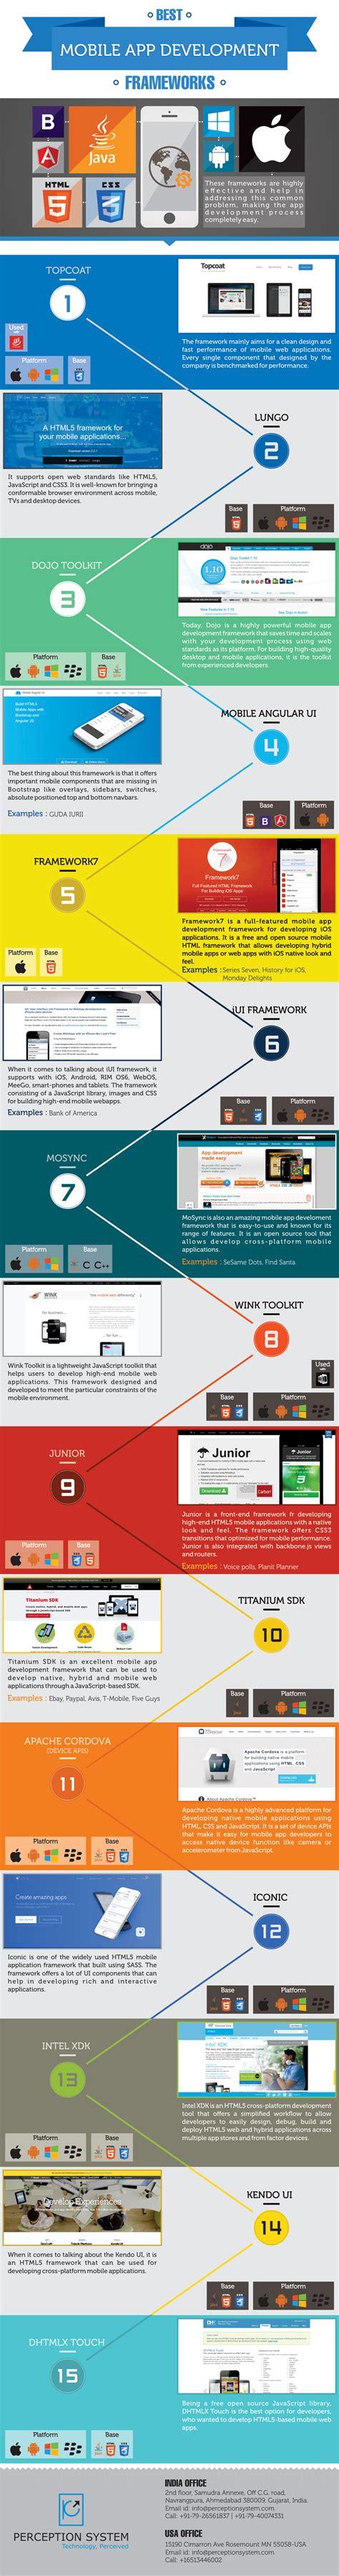 mobile app framework 10 mobile application development frameworks for your